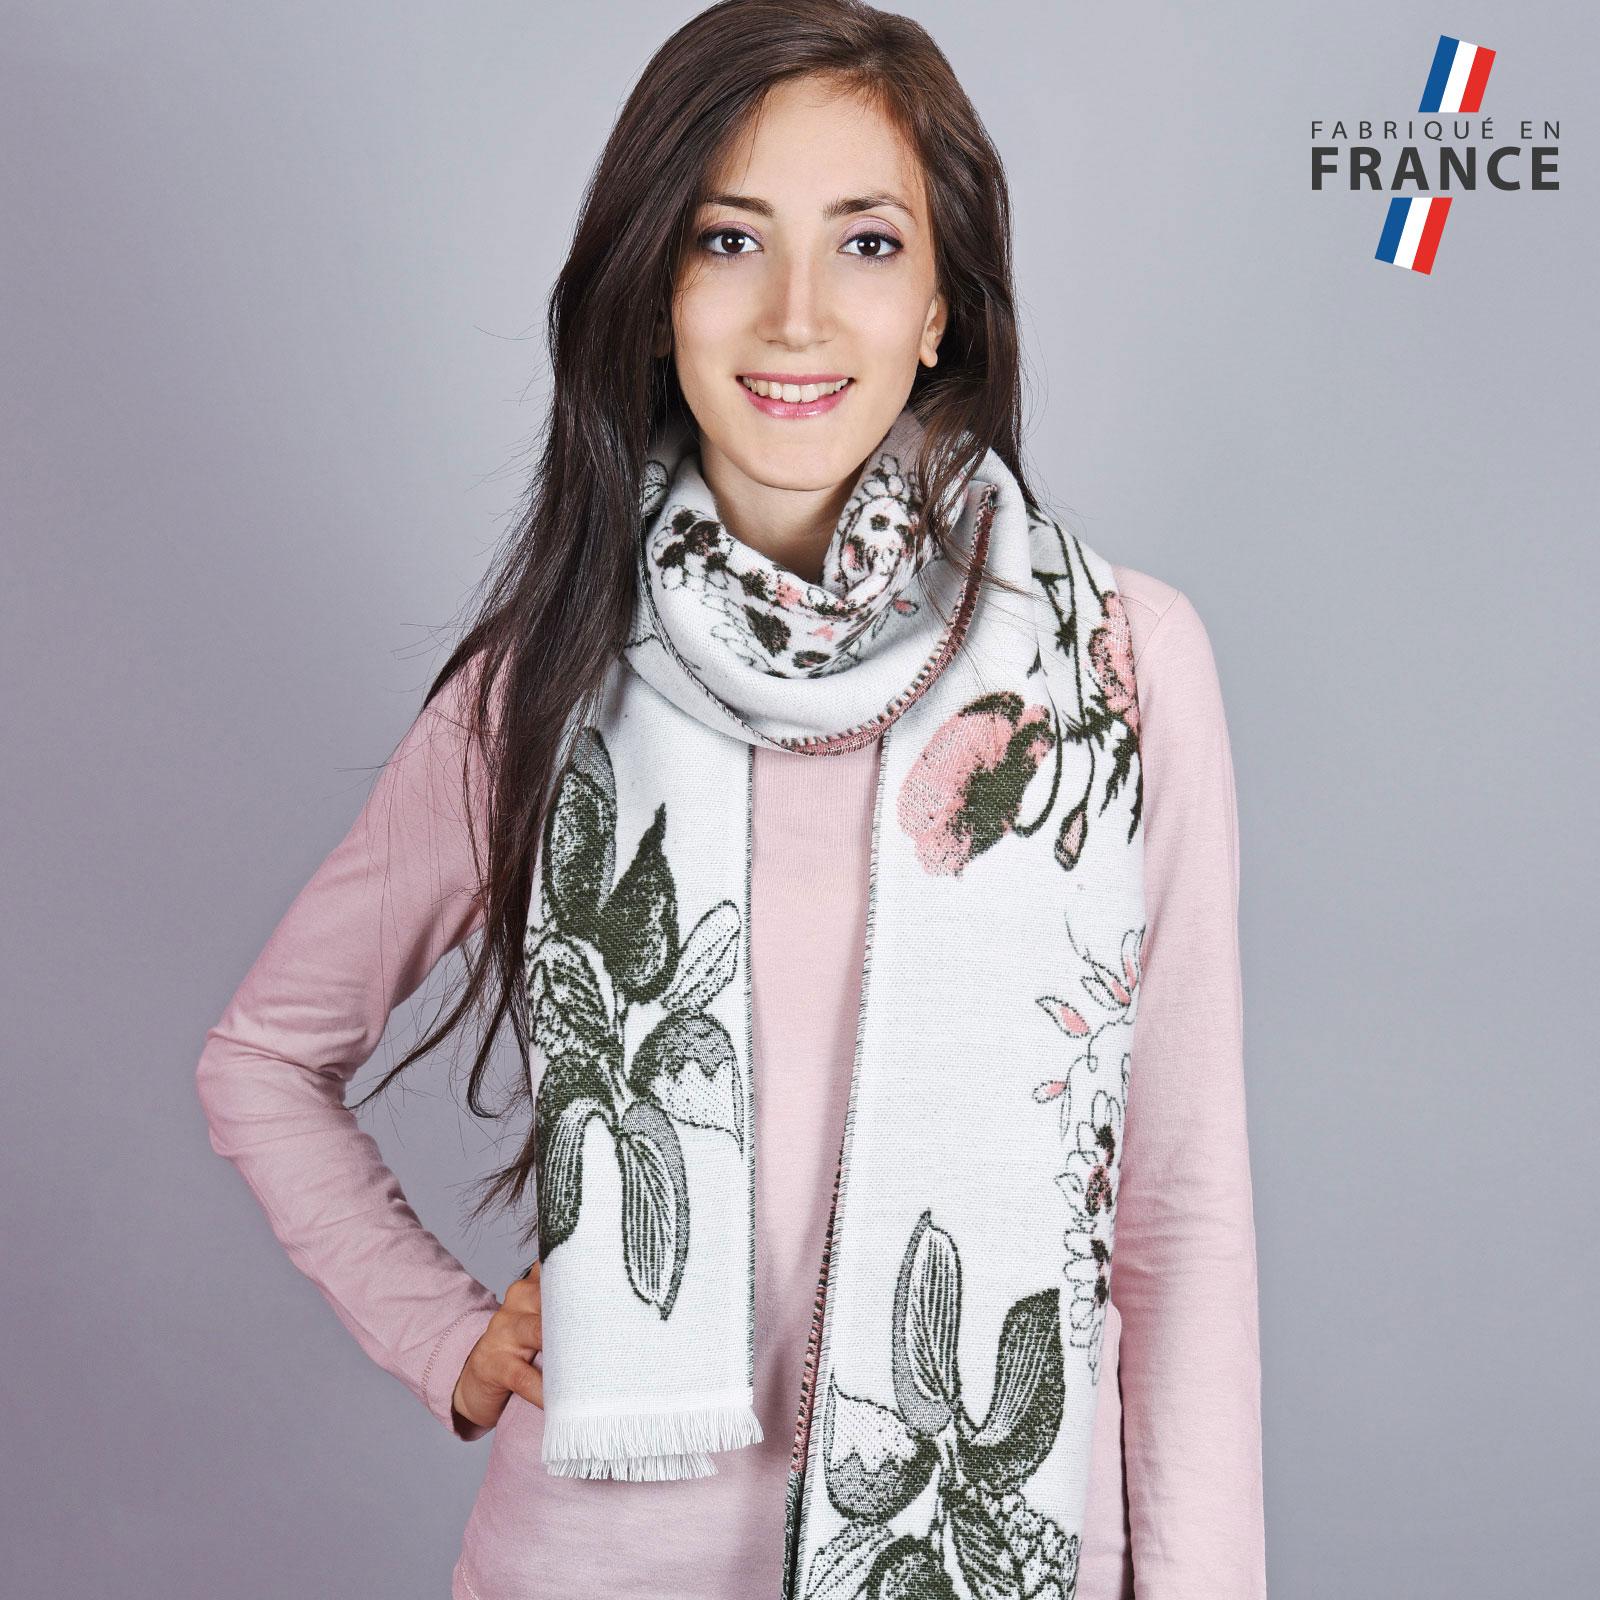 AT-04528-VF16-1-LB_FR-echarpe-femme-blanche-coquelicot